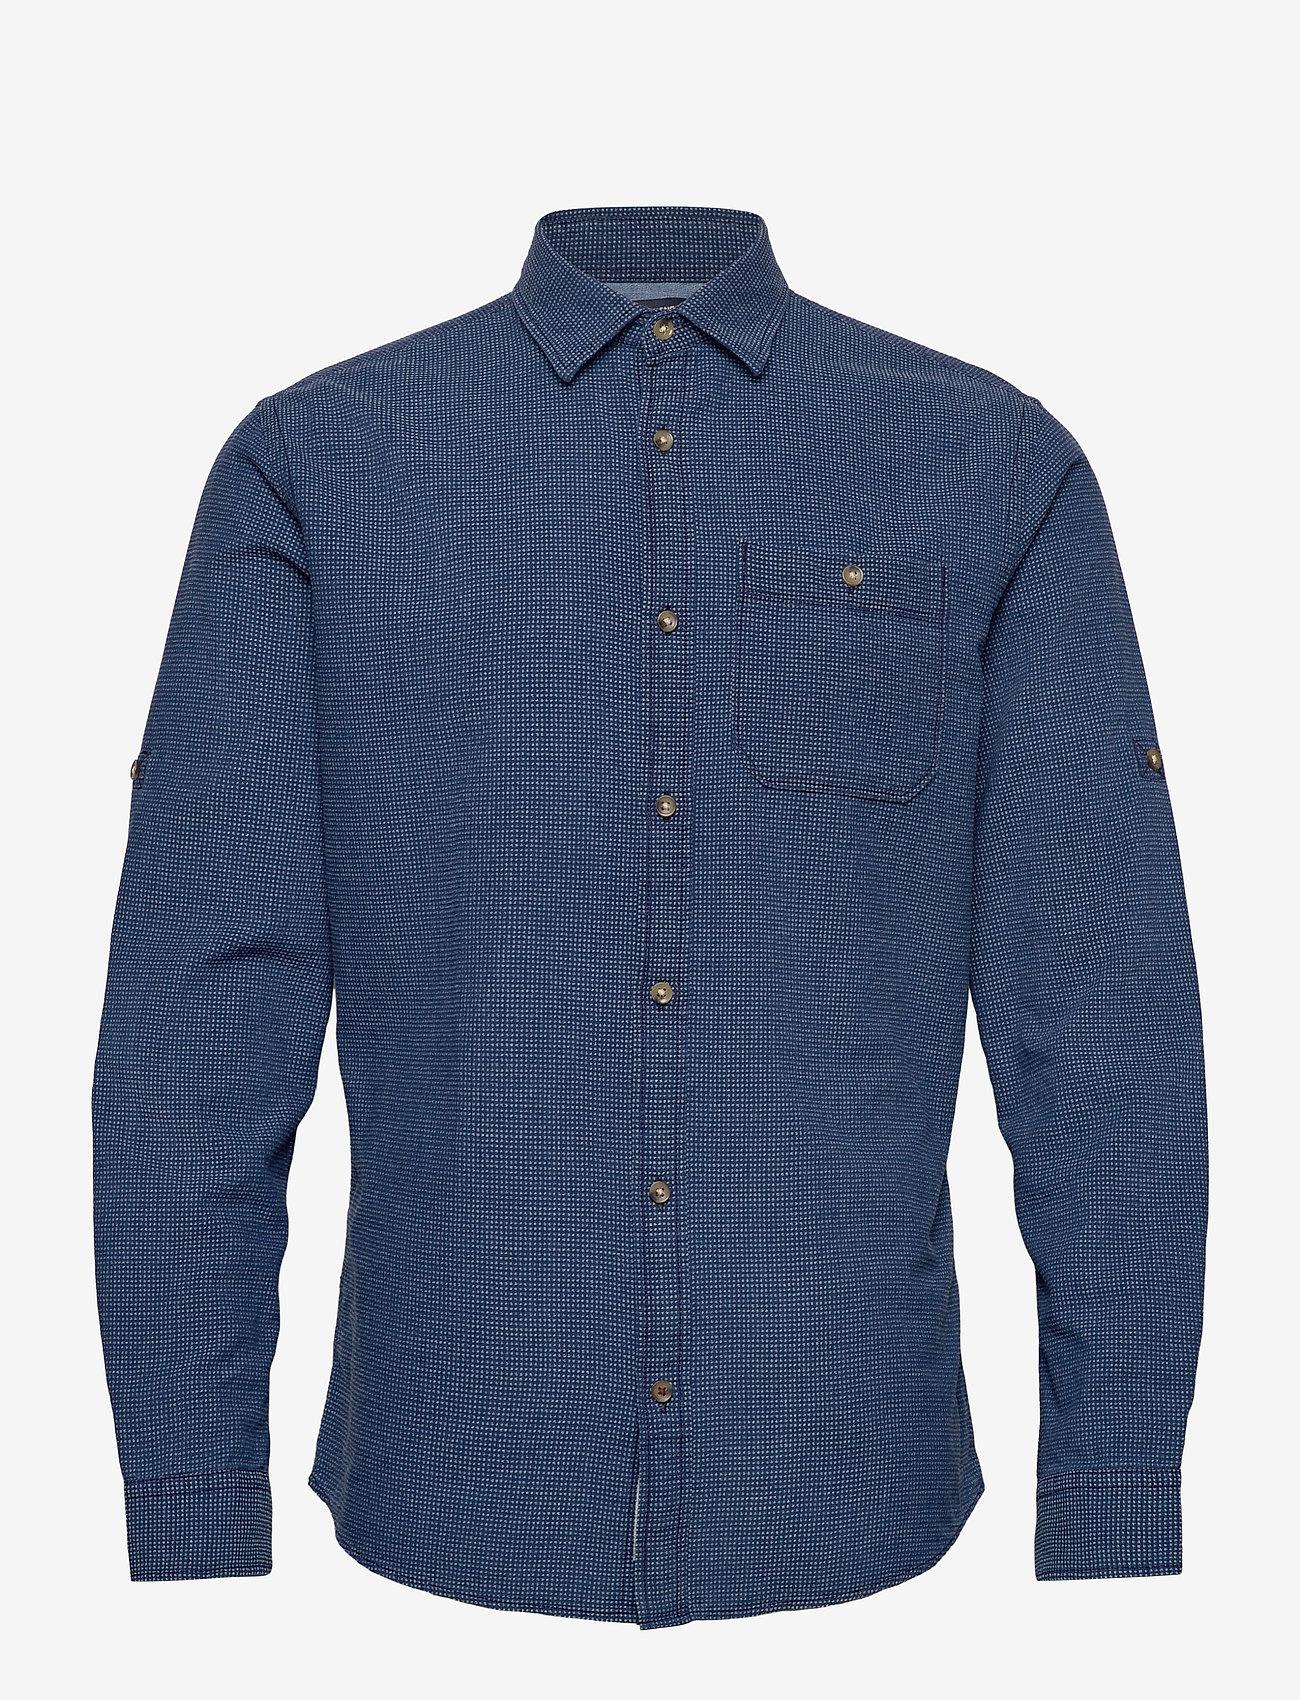 Jack & Jones - JPRBLUEASTON SHIRT L/S ONE POCKET - casual skjortor - denim blue - 0